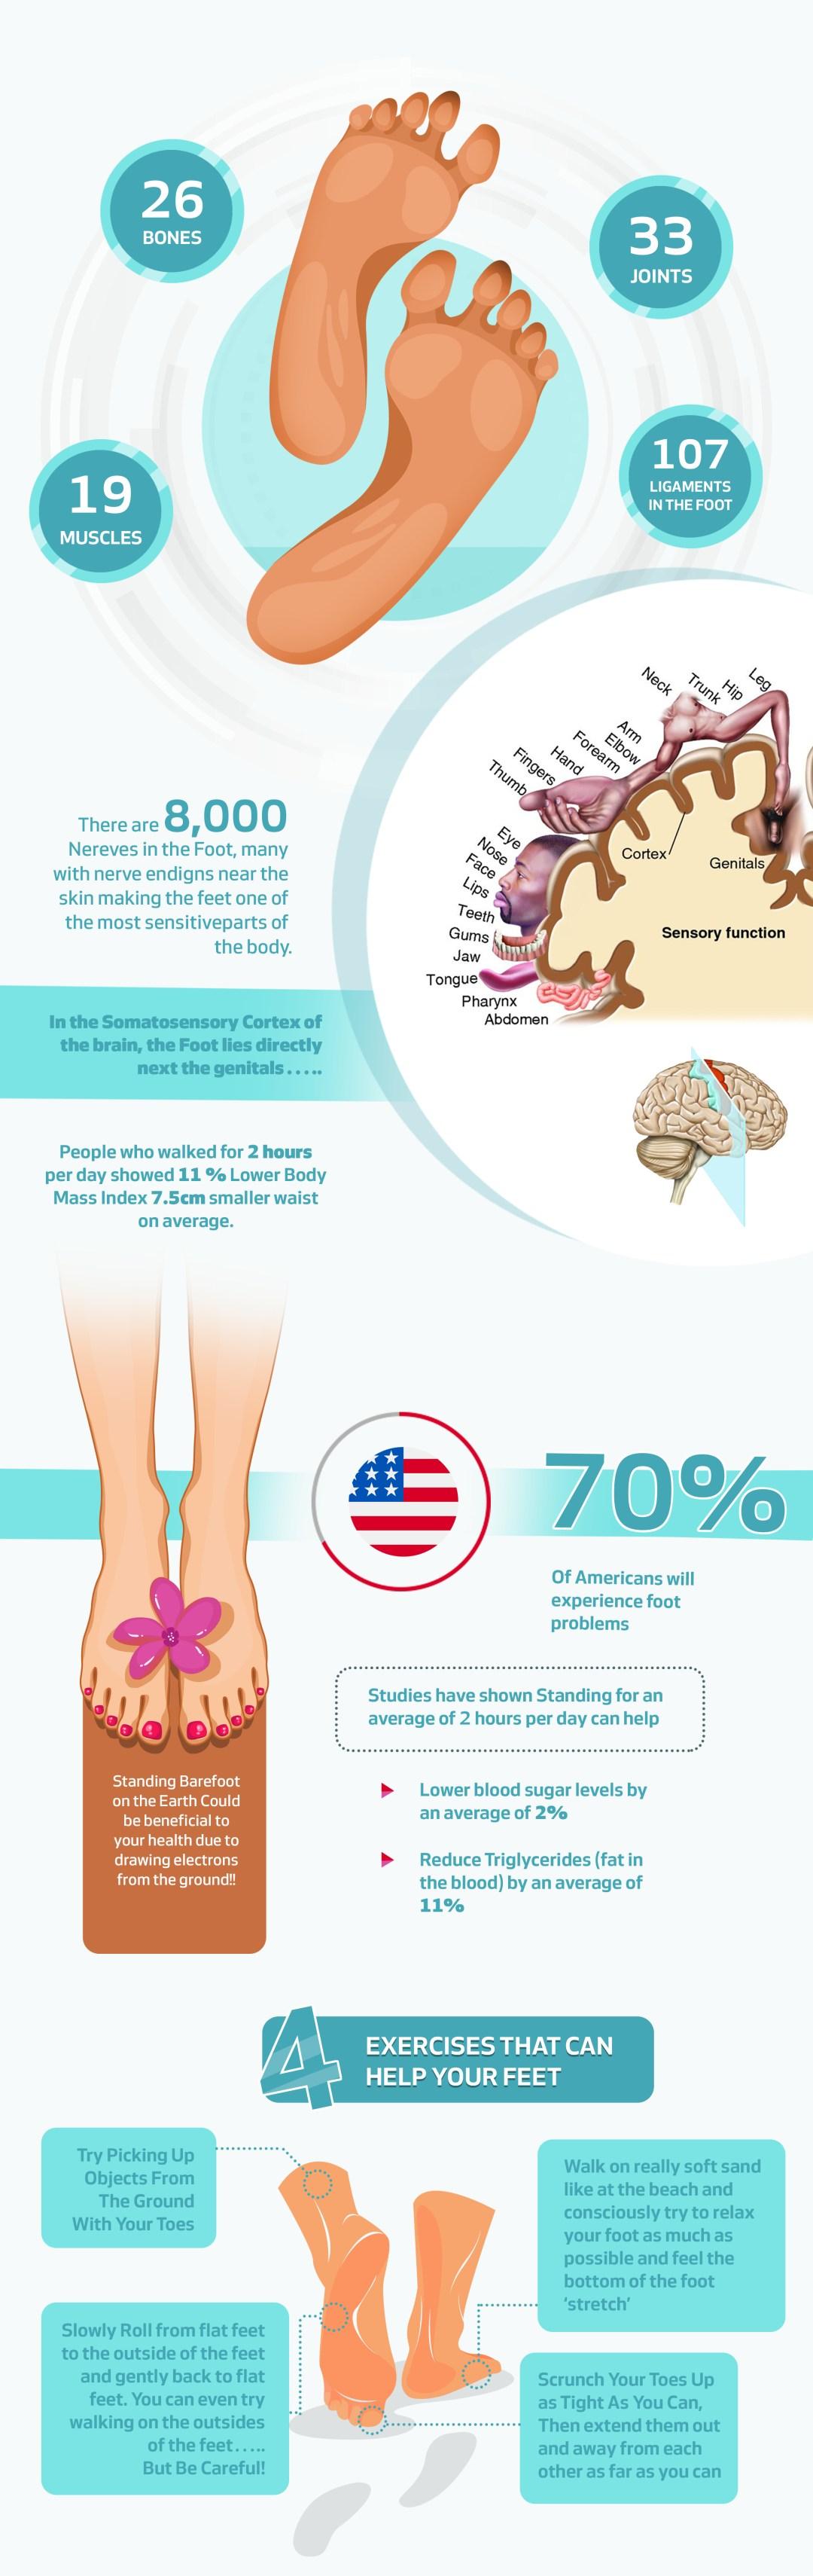 feet infographic amn academy barefoot